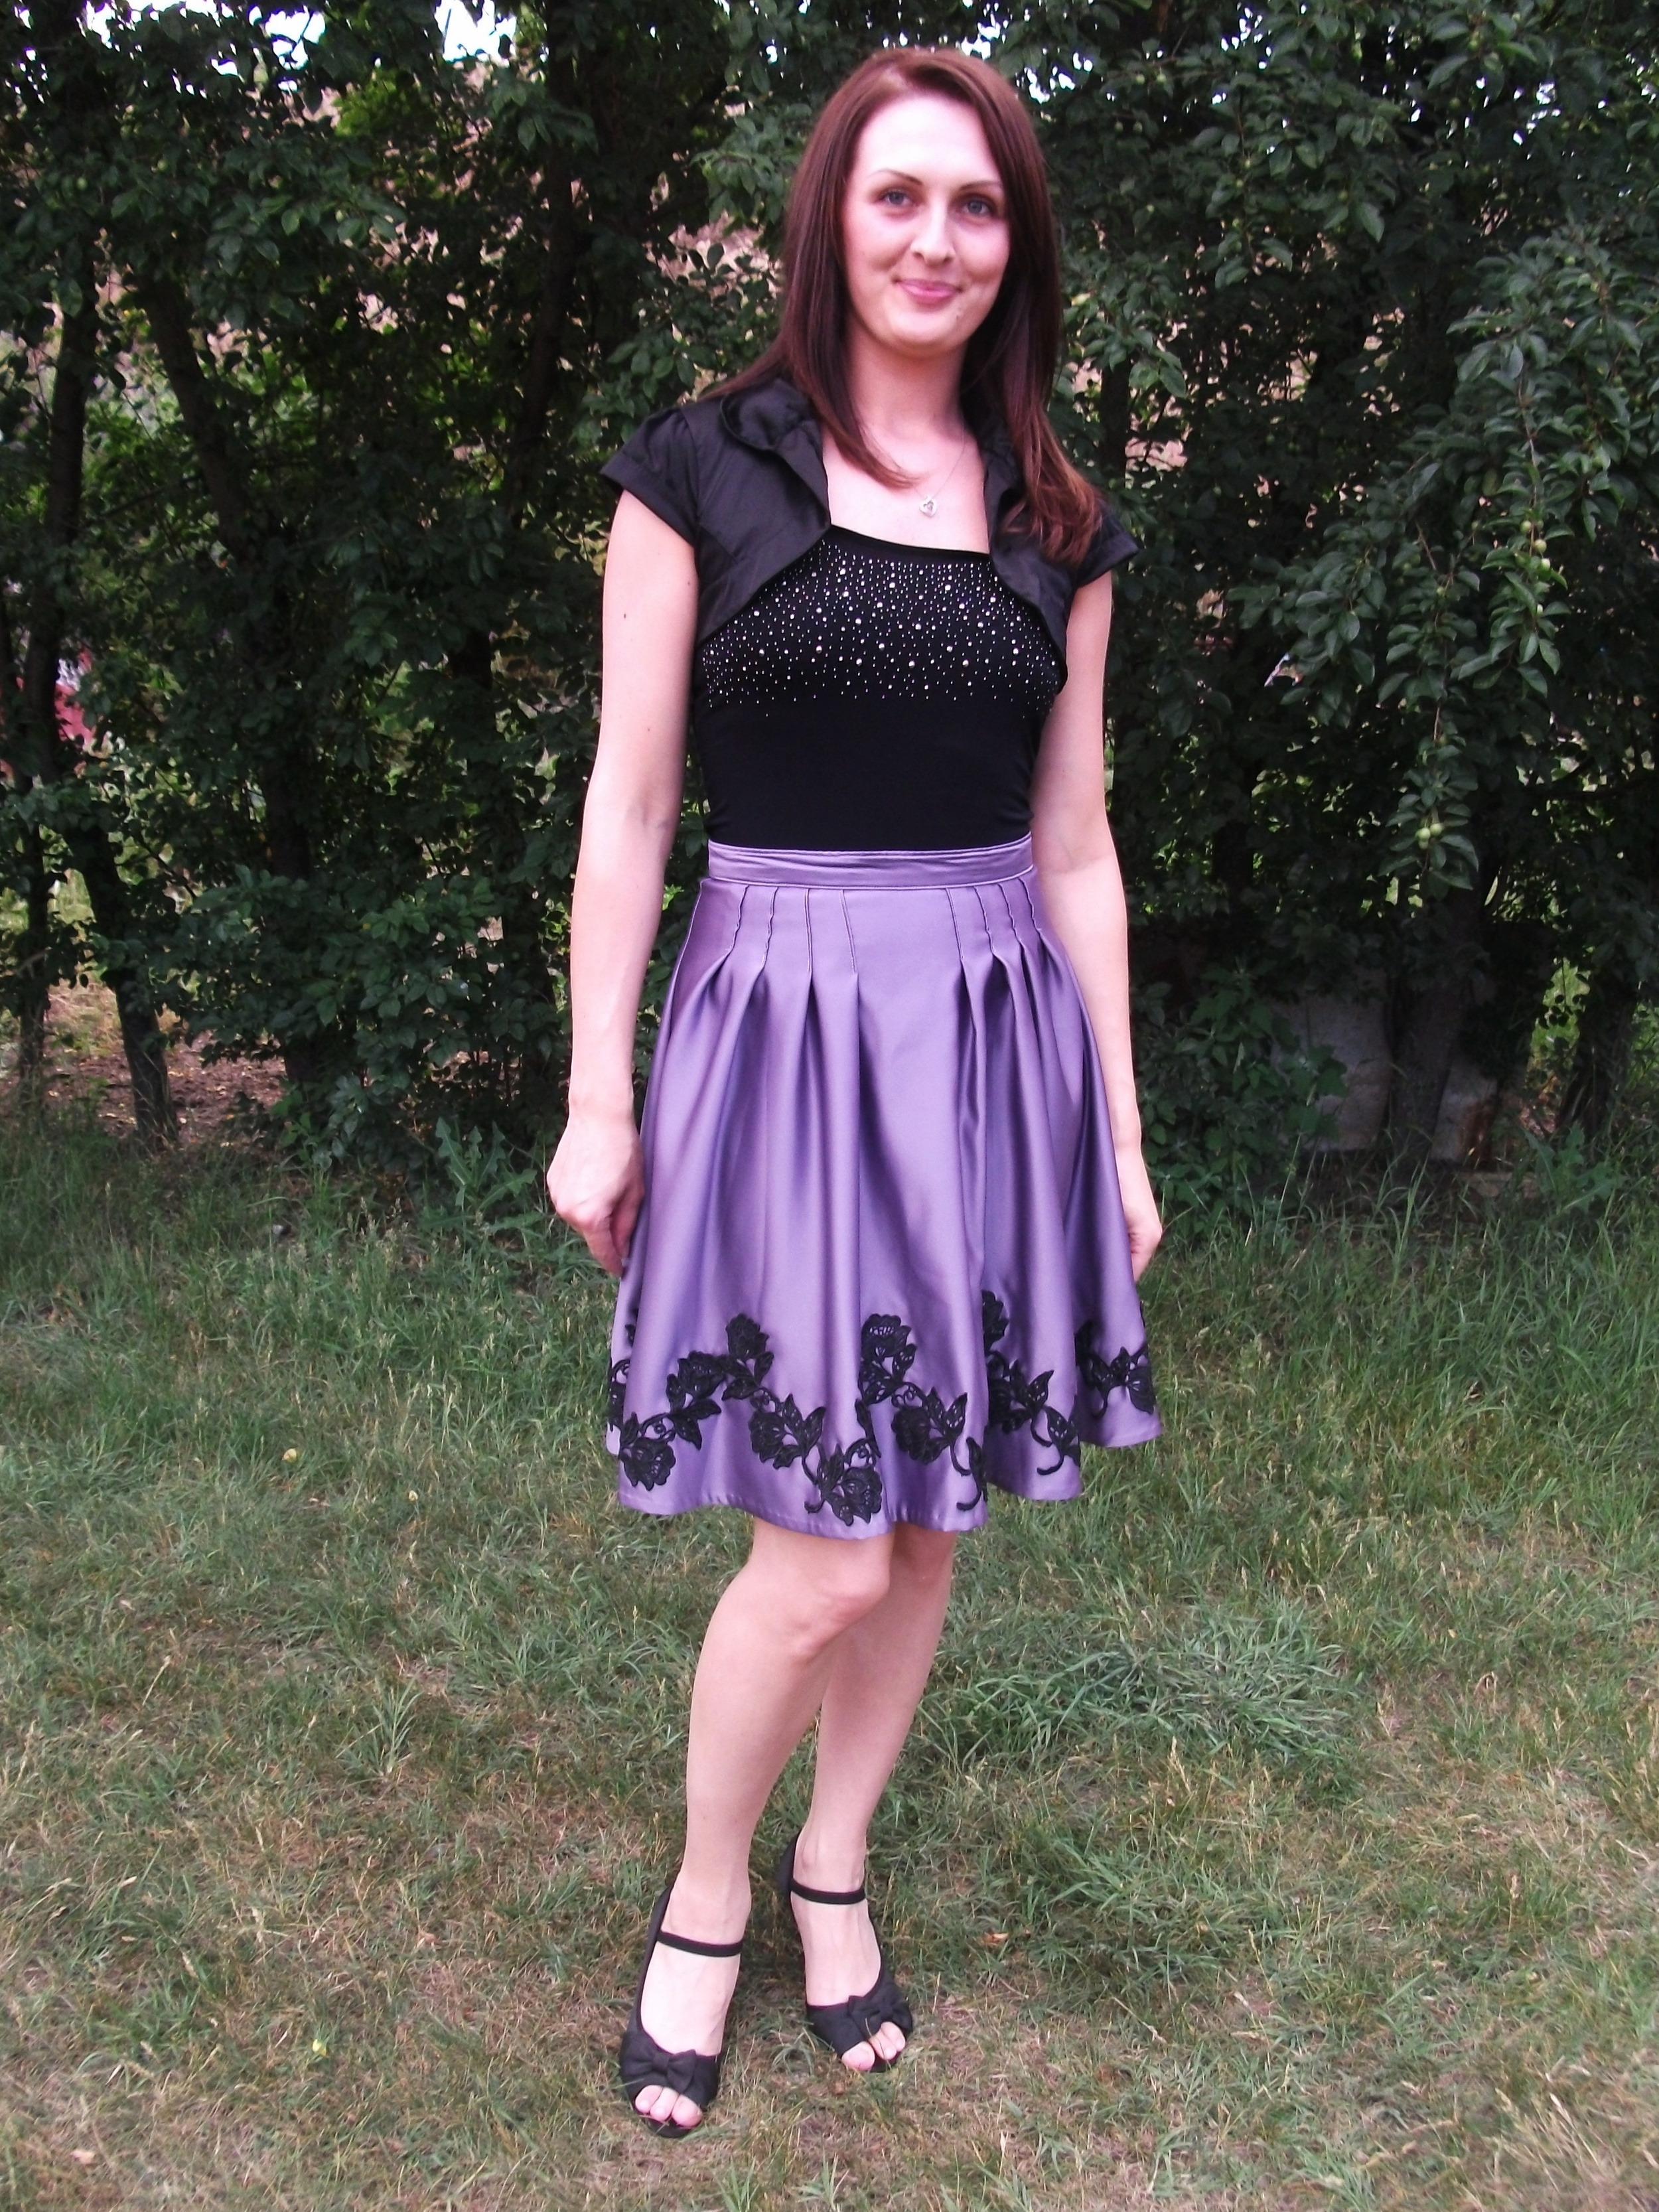 Eva in her satin skirt